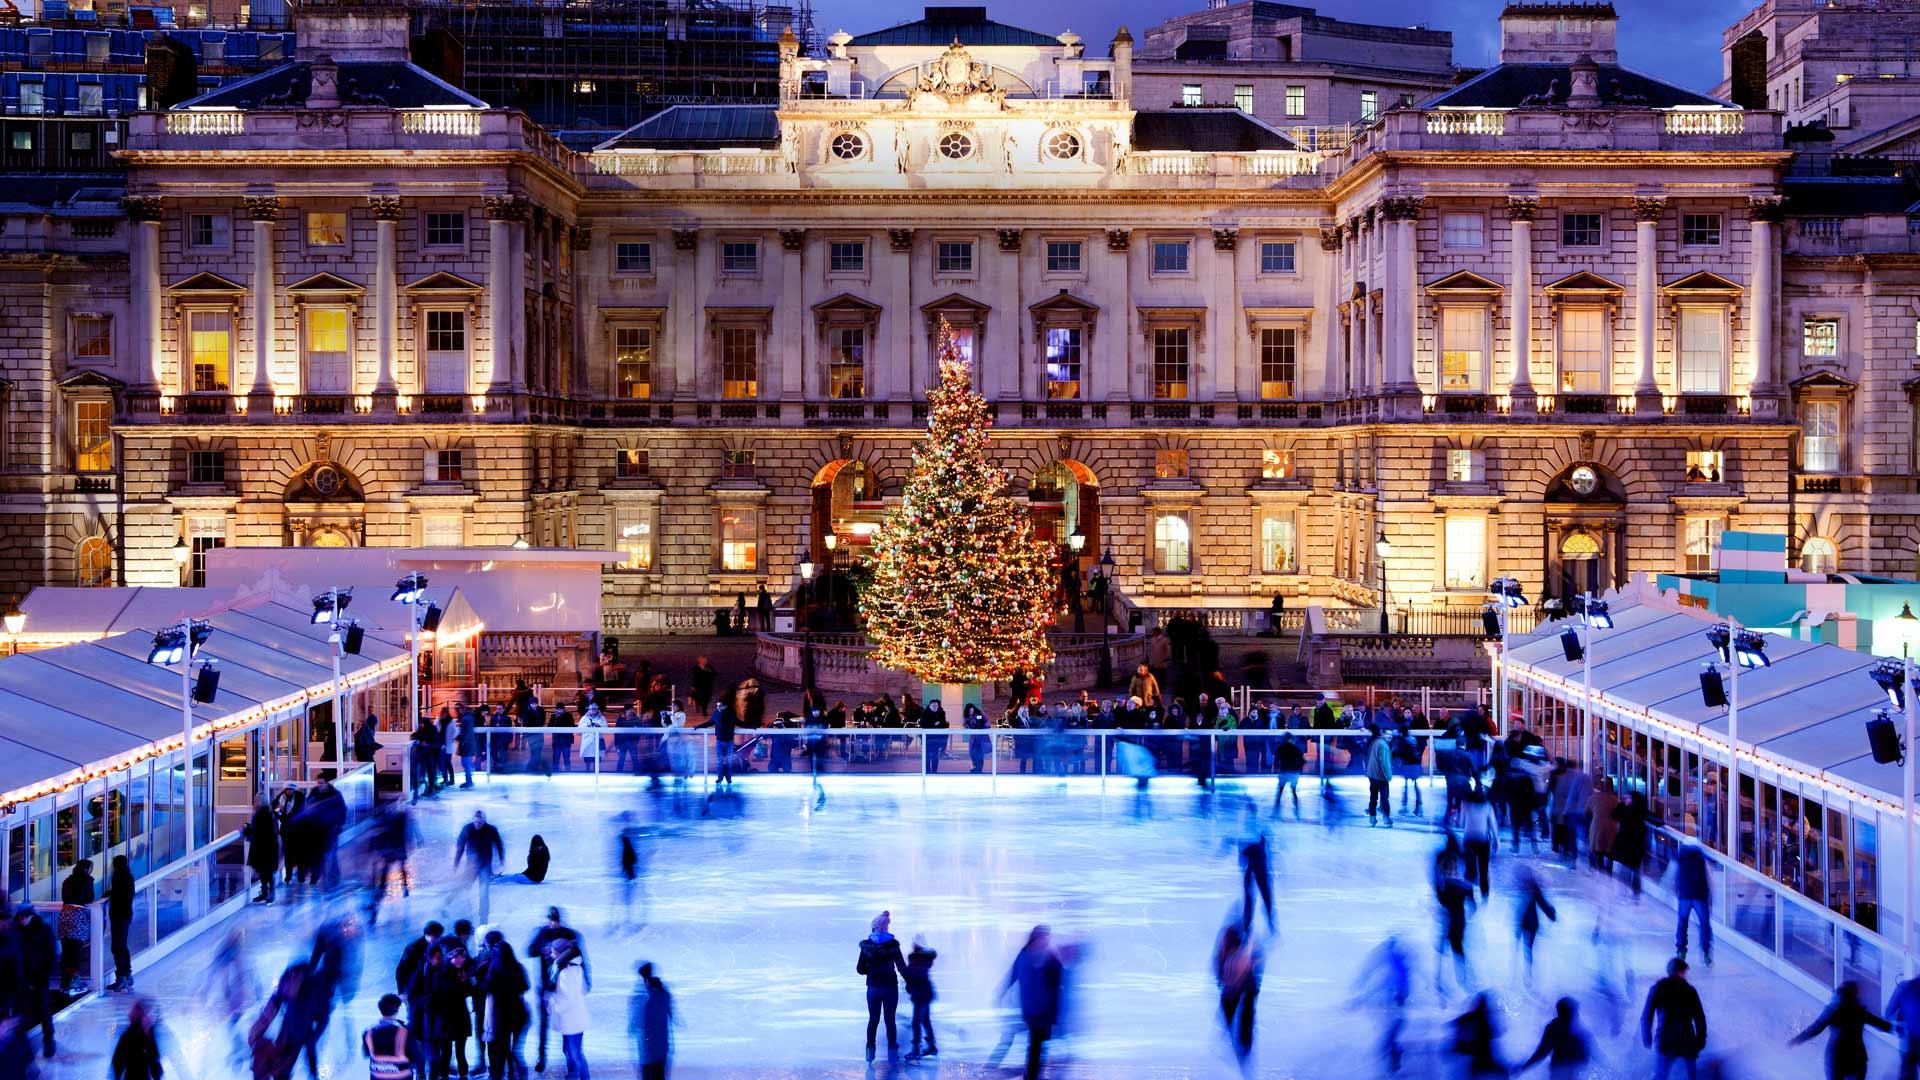 Best Ice Rinks in London 2015